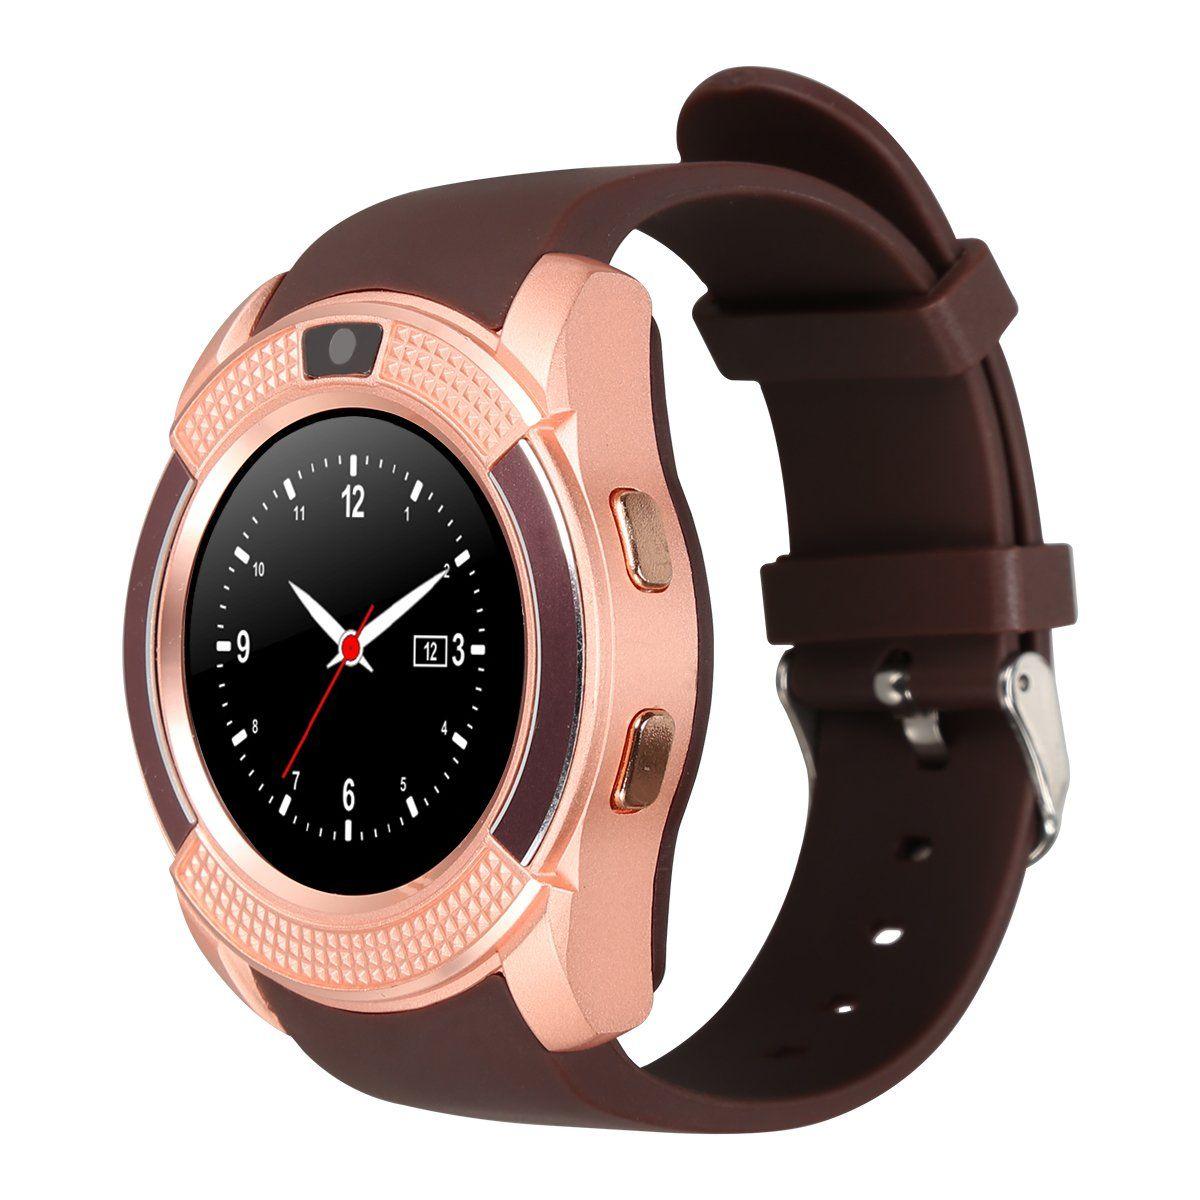 6d3dbe2e2ad V8 Smart Watch